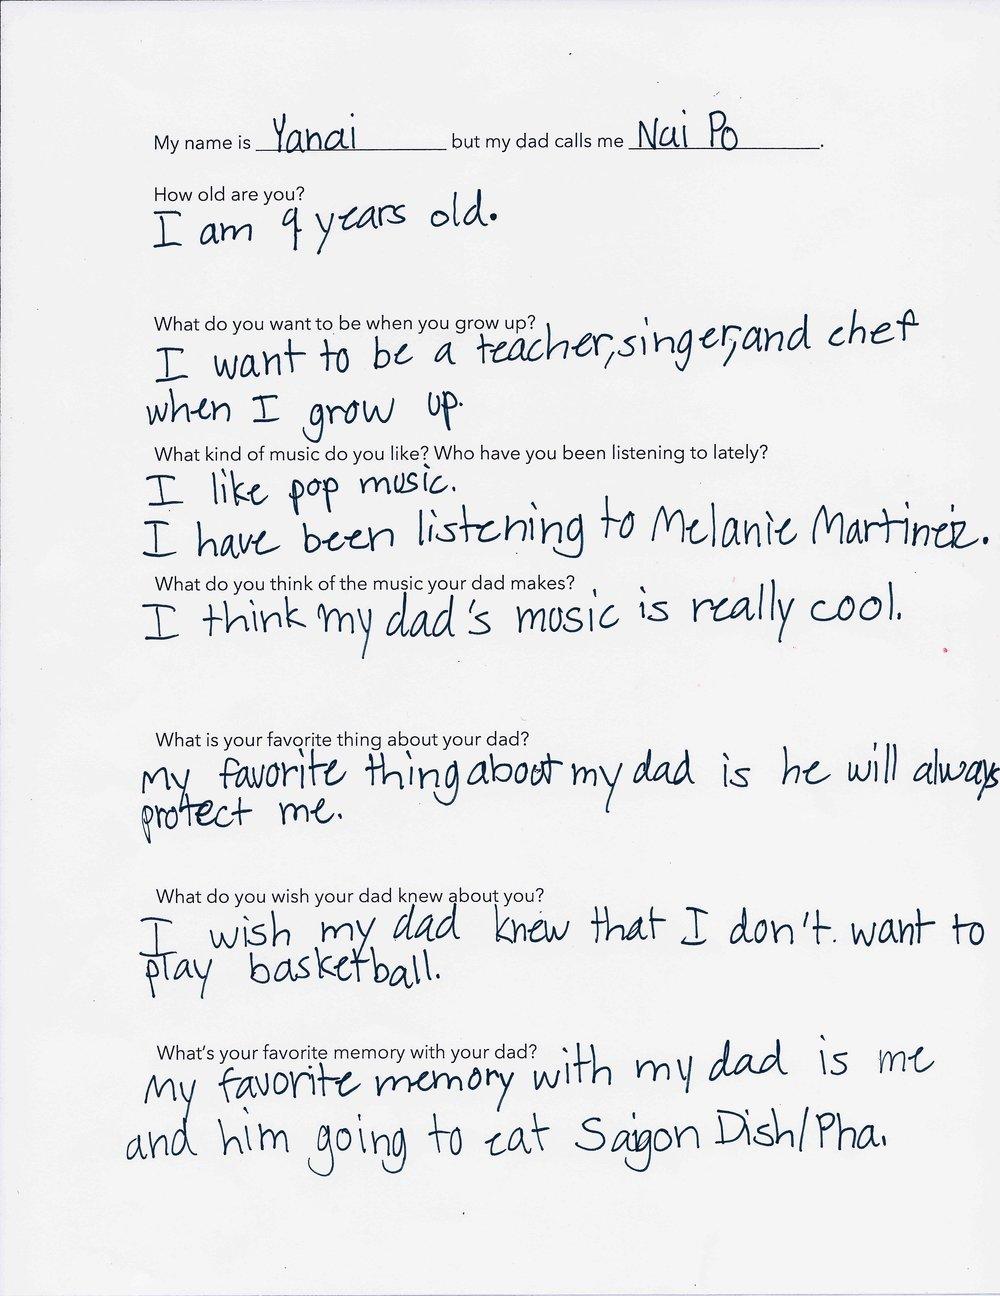 Yanai's Questionnaire